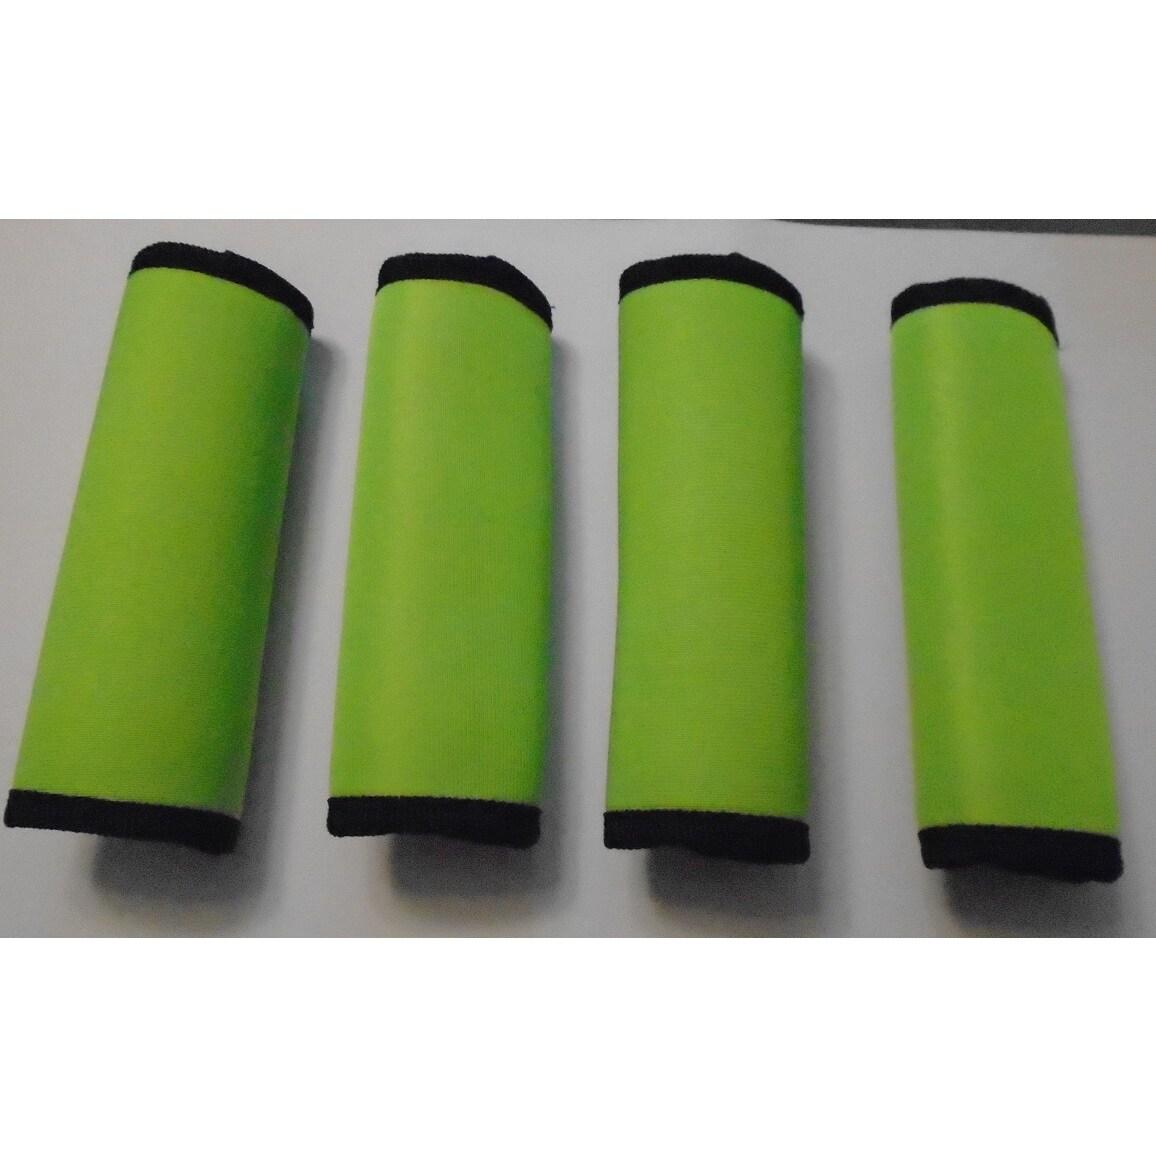 Super Grabber Lime Green Neoprene 4-piece Handle Grip Luggage Spotter Set (Lime Green)